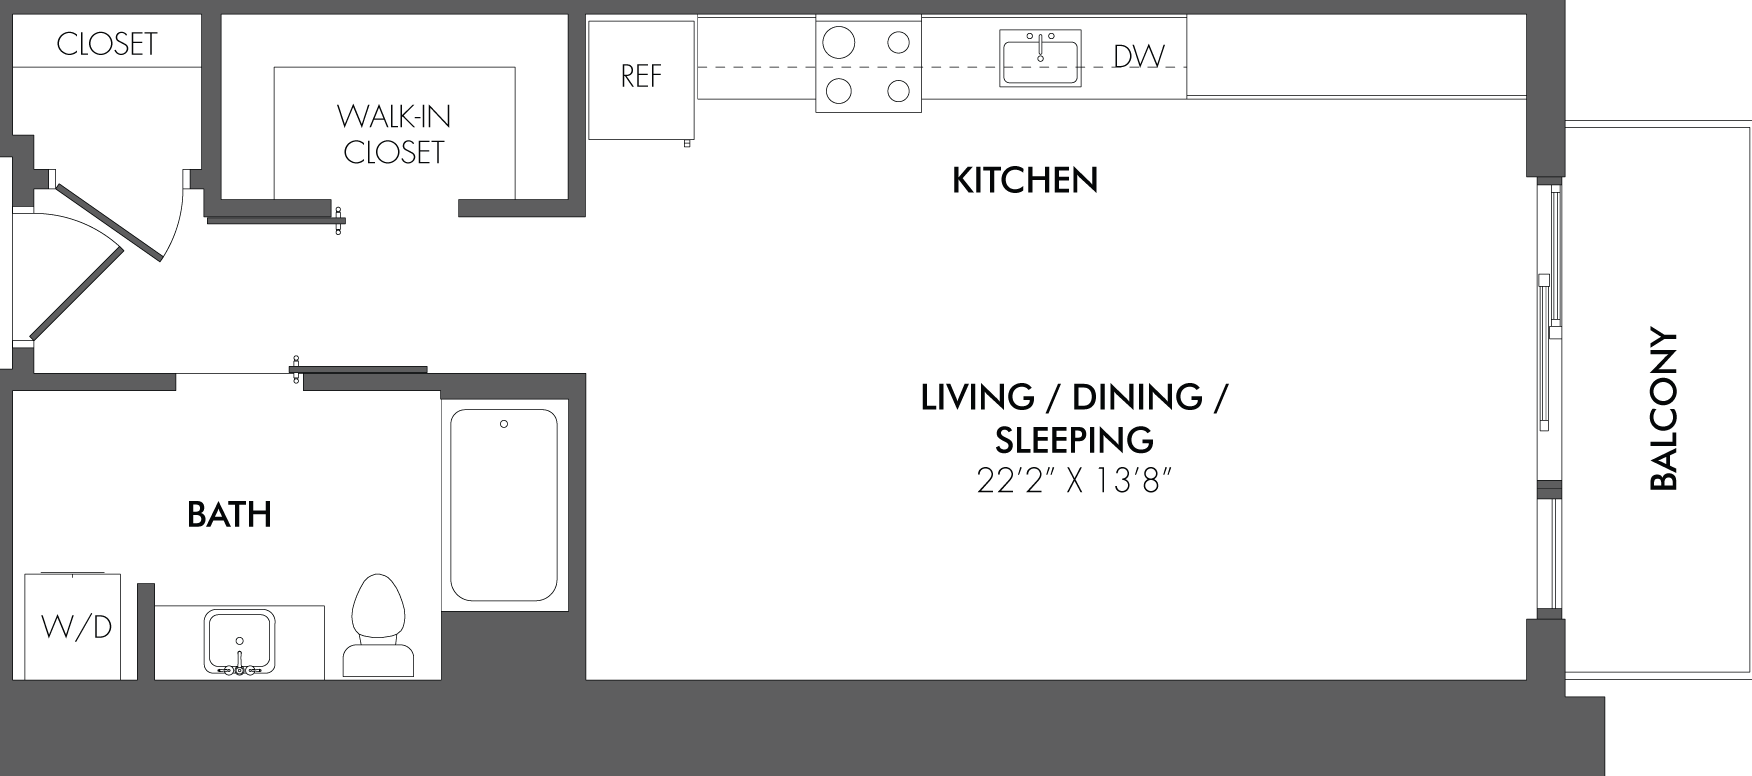 Apartment 2403 floorplan